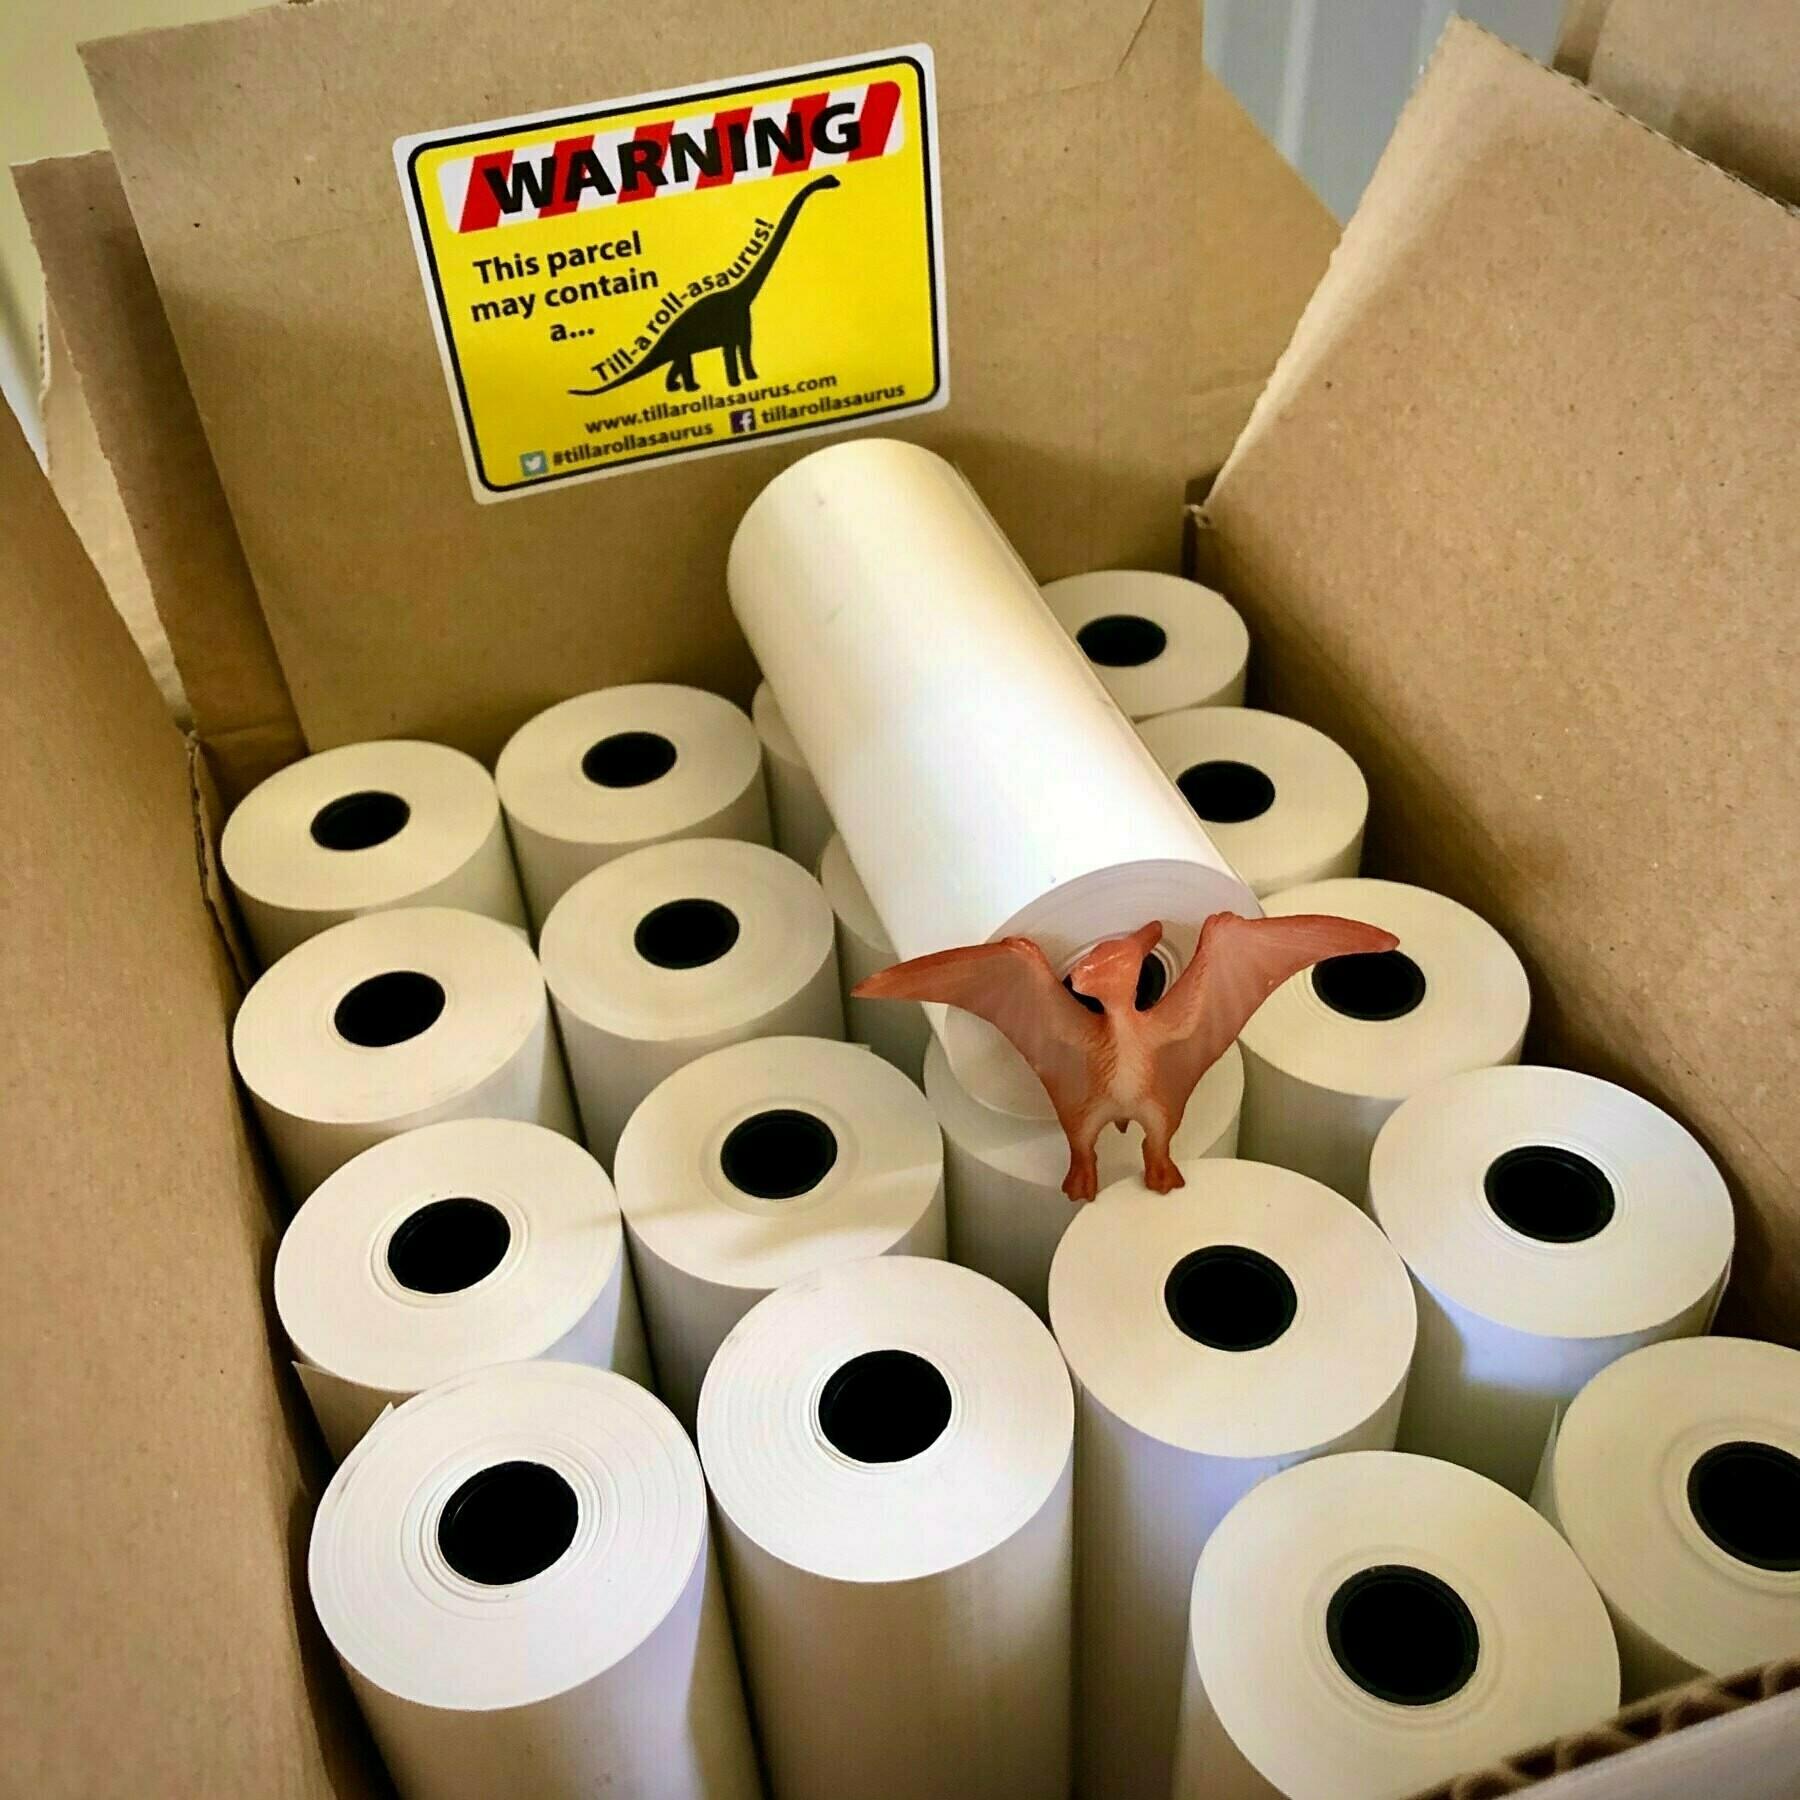 cardboard box full of till rolls and a plastic dinosaur toy